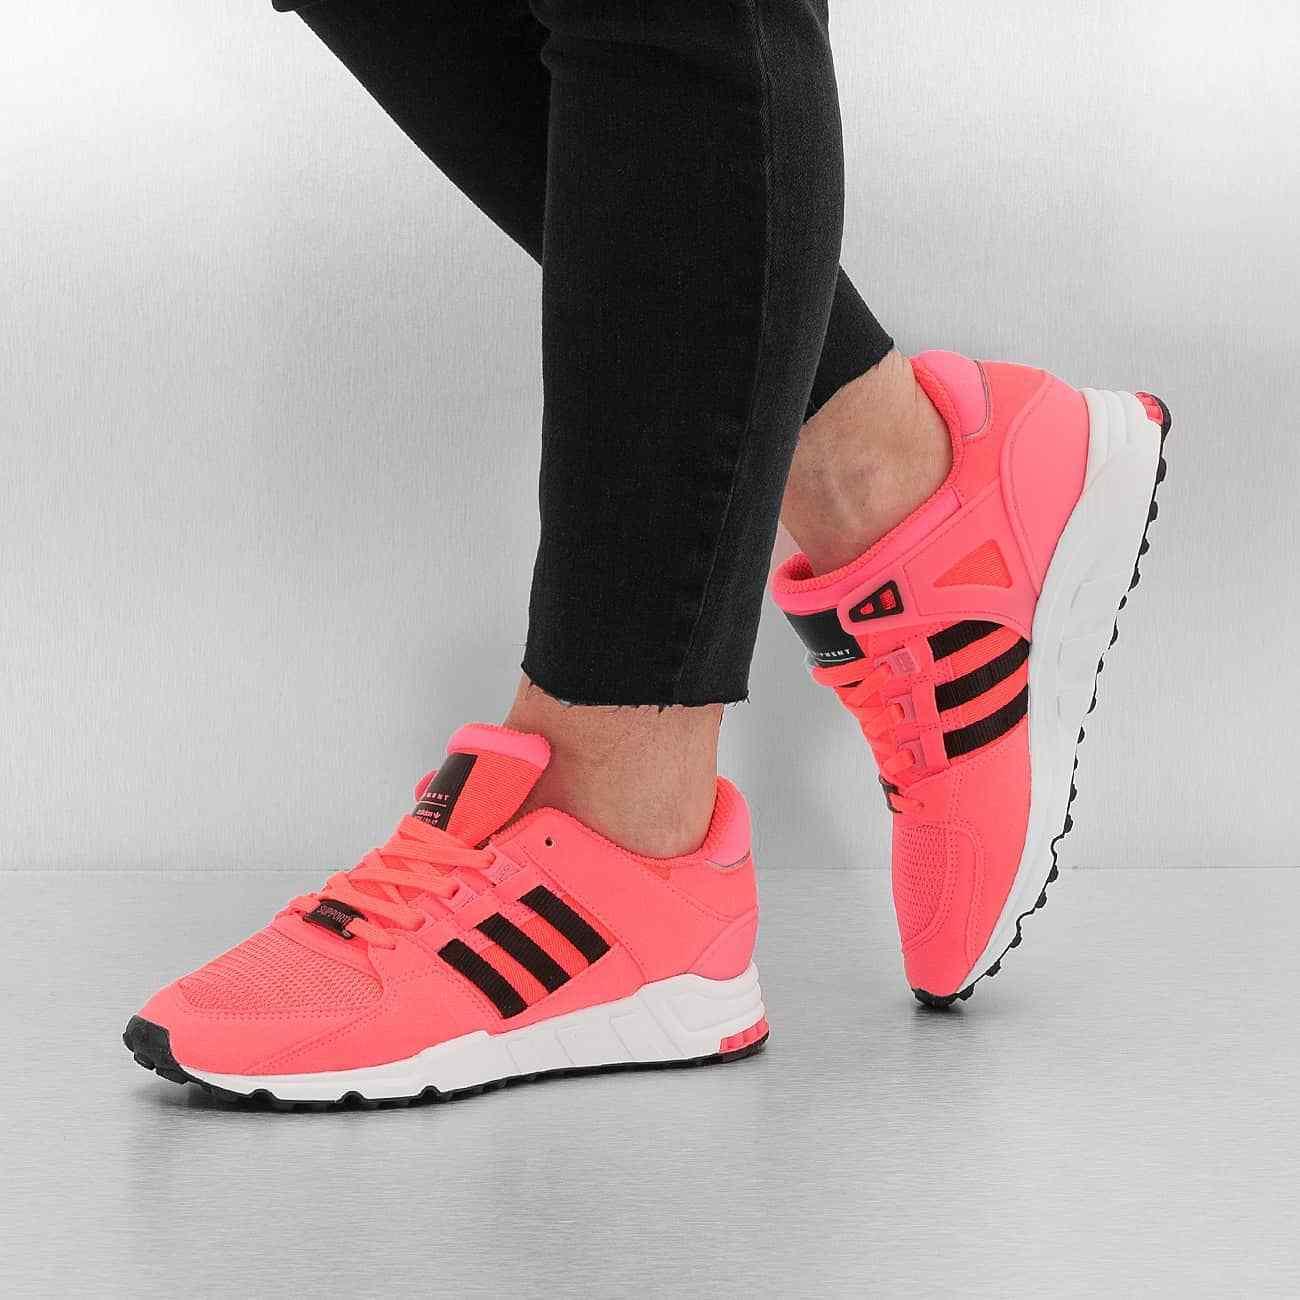 Adidas EQT Support RF 91-17 Equipment Turbo Red Black Men's Running Shoes 11.5